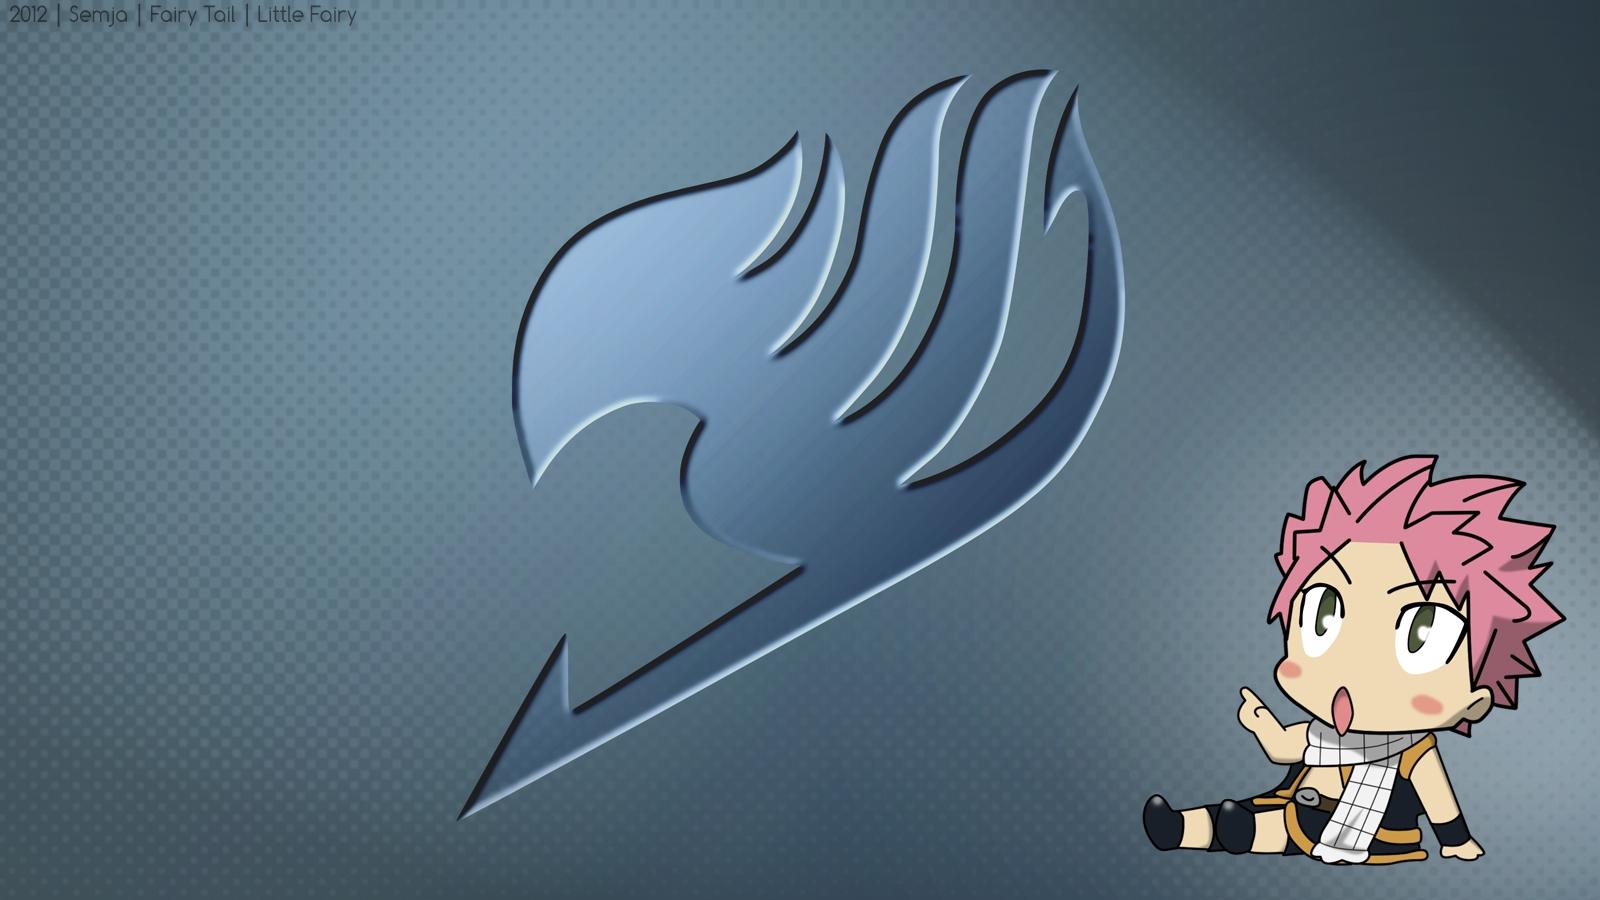 FAIRY TAIL Logo wallpaper   ForWallpapercom 1600x900